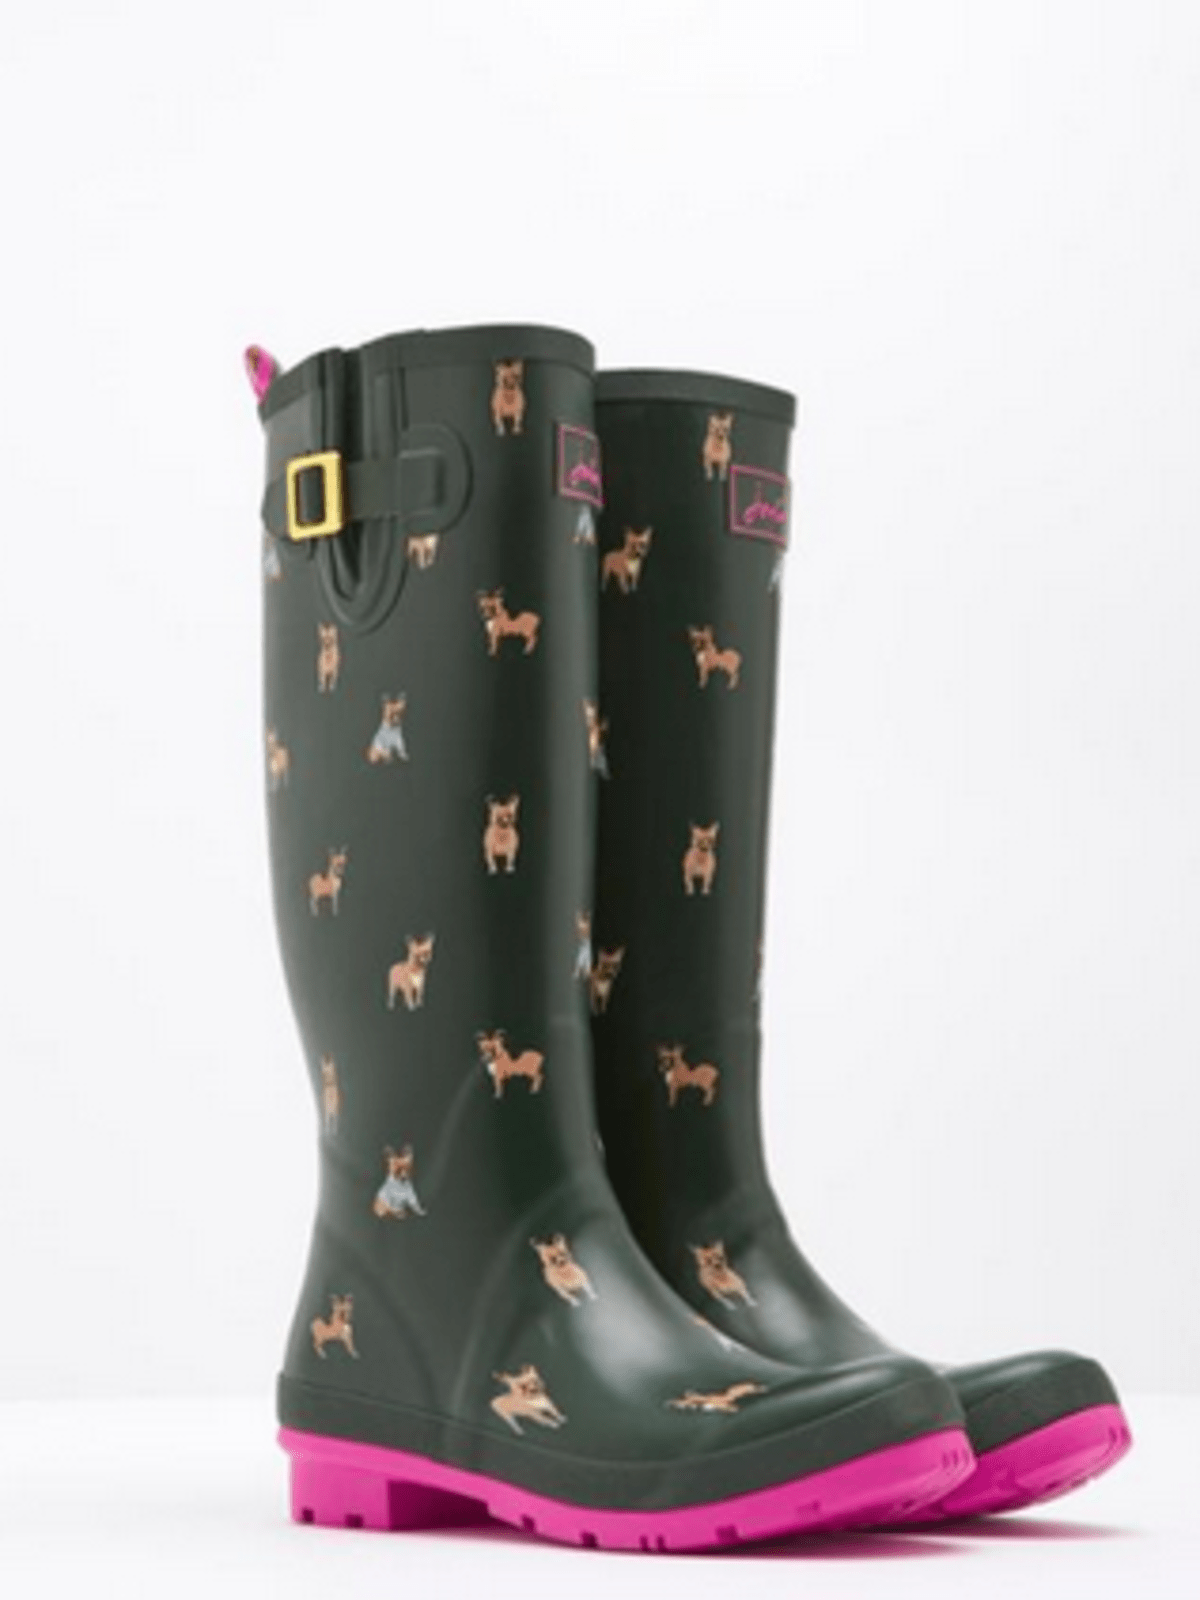 Wellyprint Olive Bulldog Rain Boots, $74.95